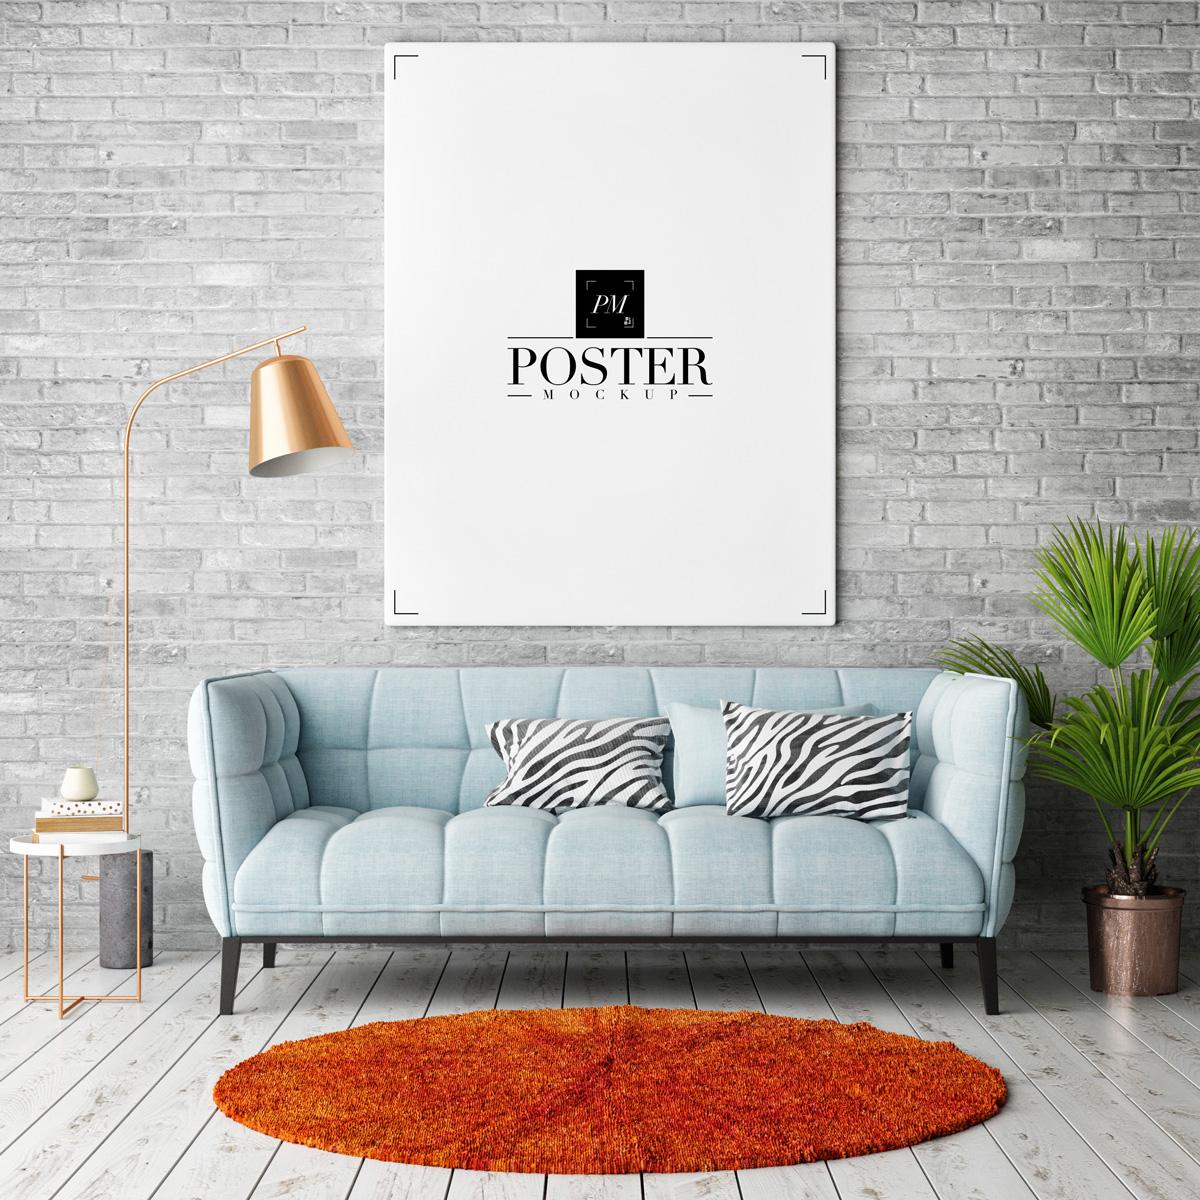 Elegant Room Interior Frame Poster Mockup PSD